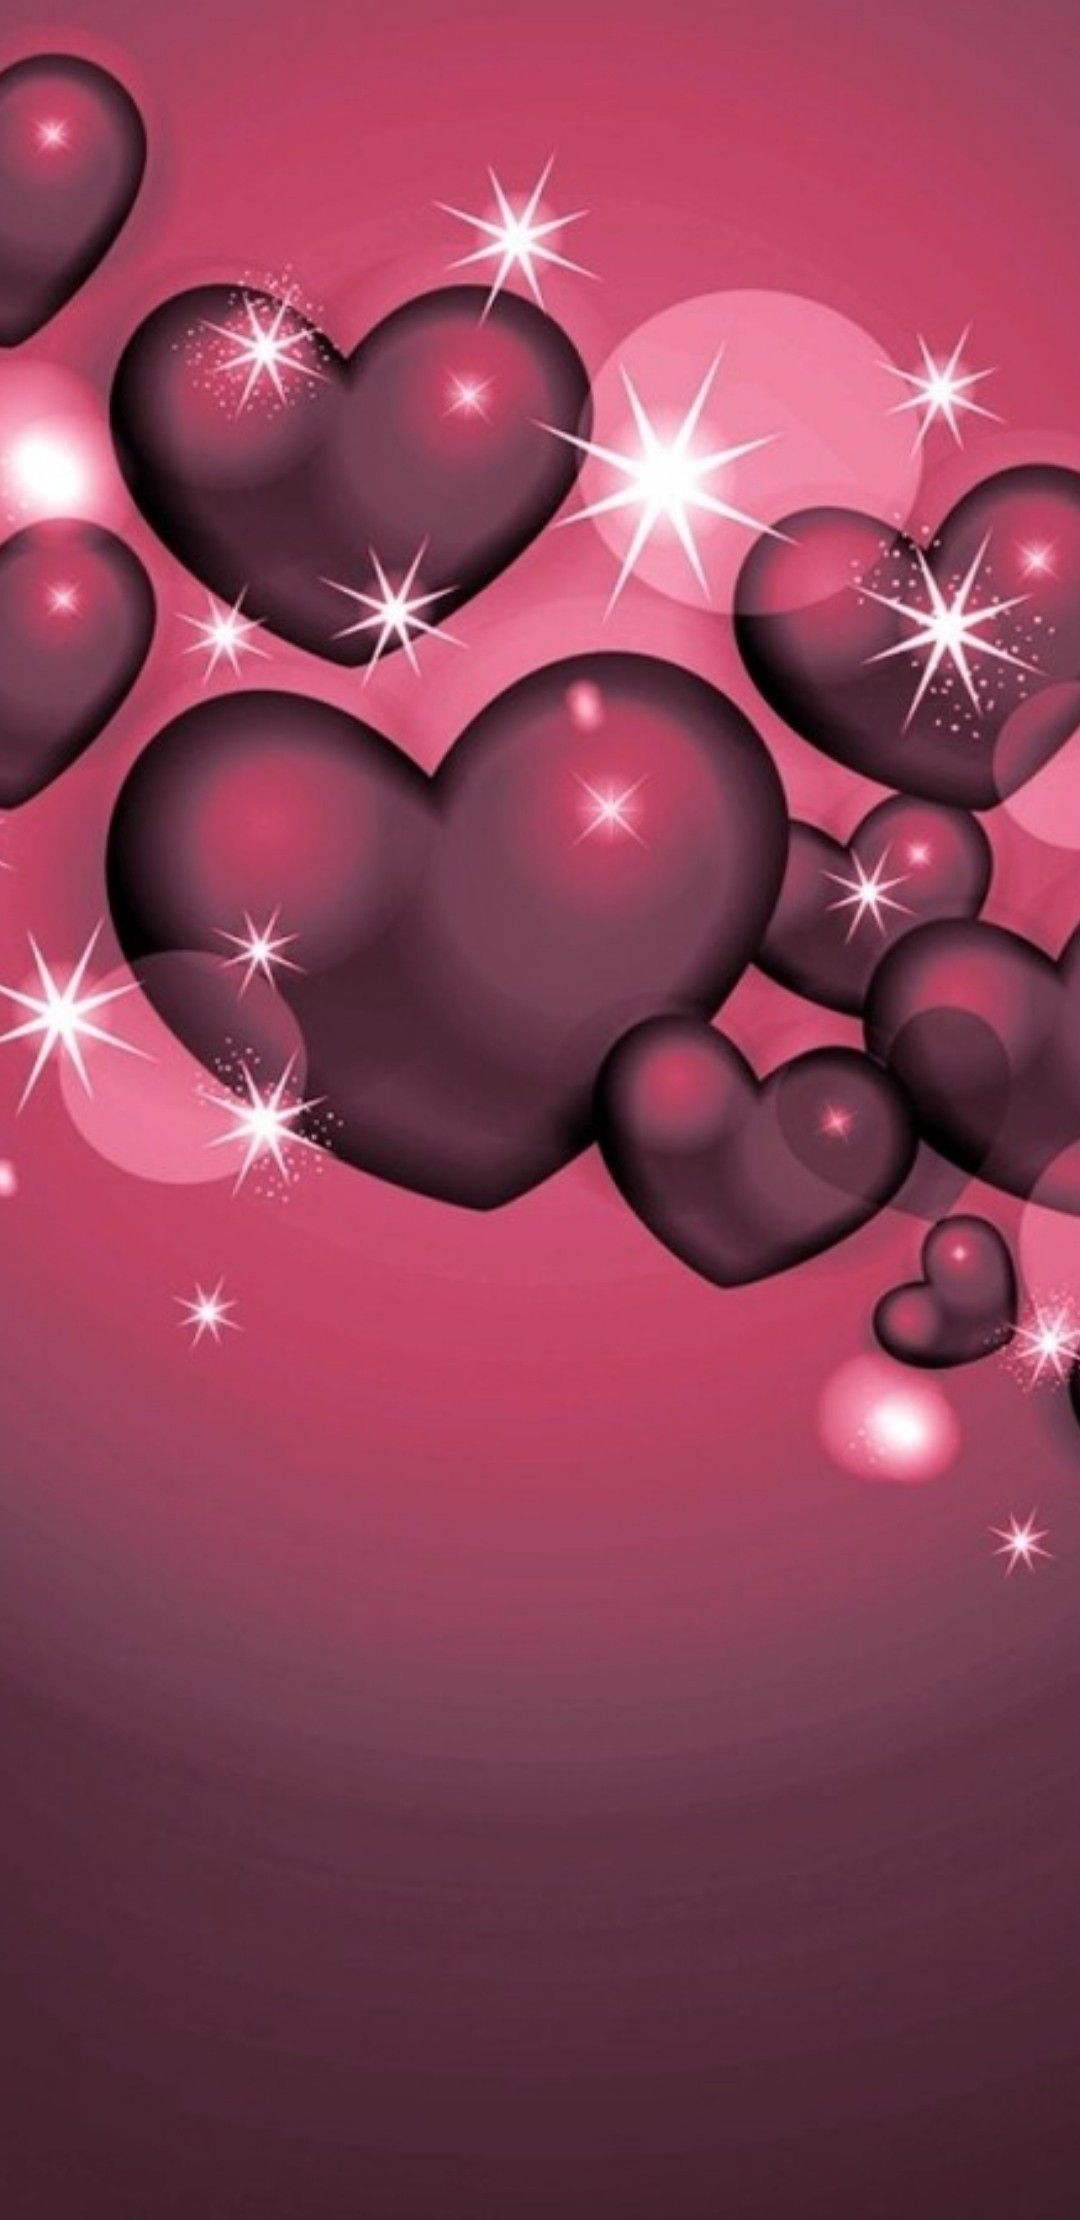 Sanrio Wallpaper Pink Wallpaper Cellphone Wallpaper Love